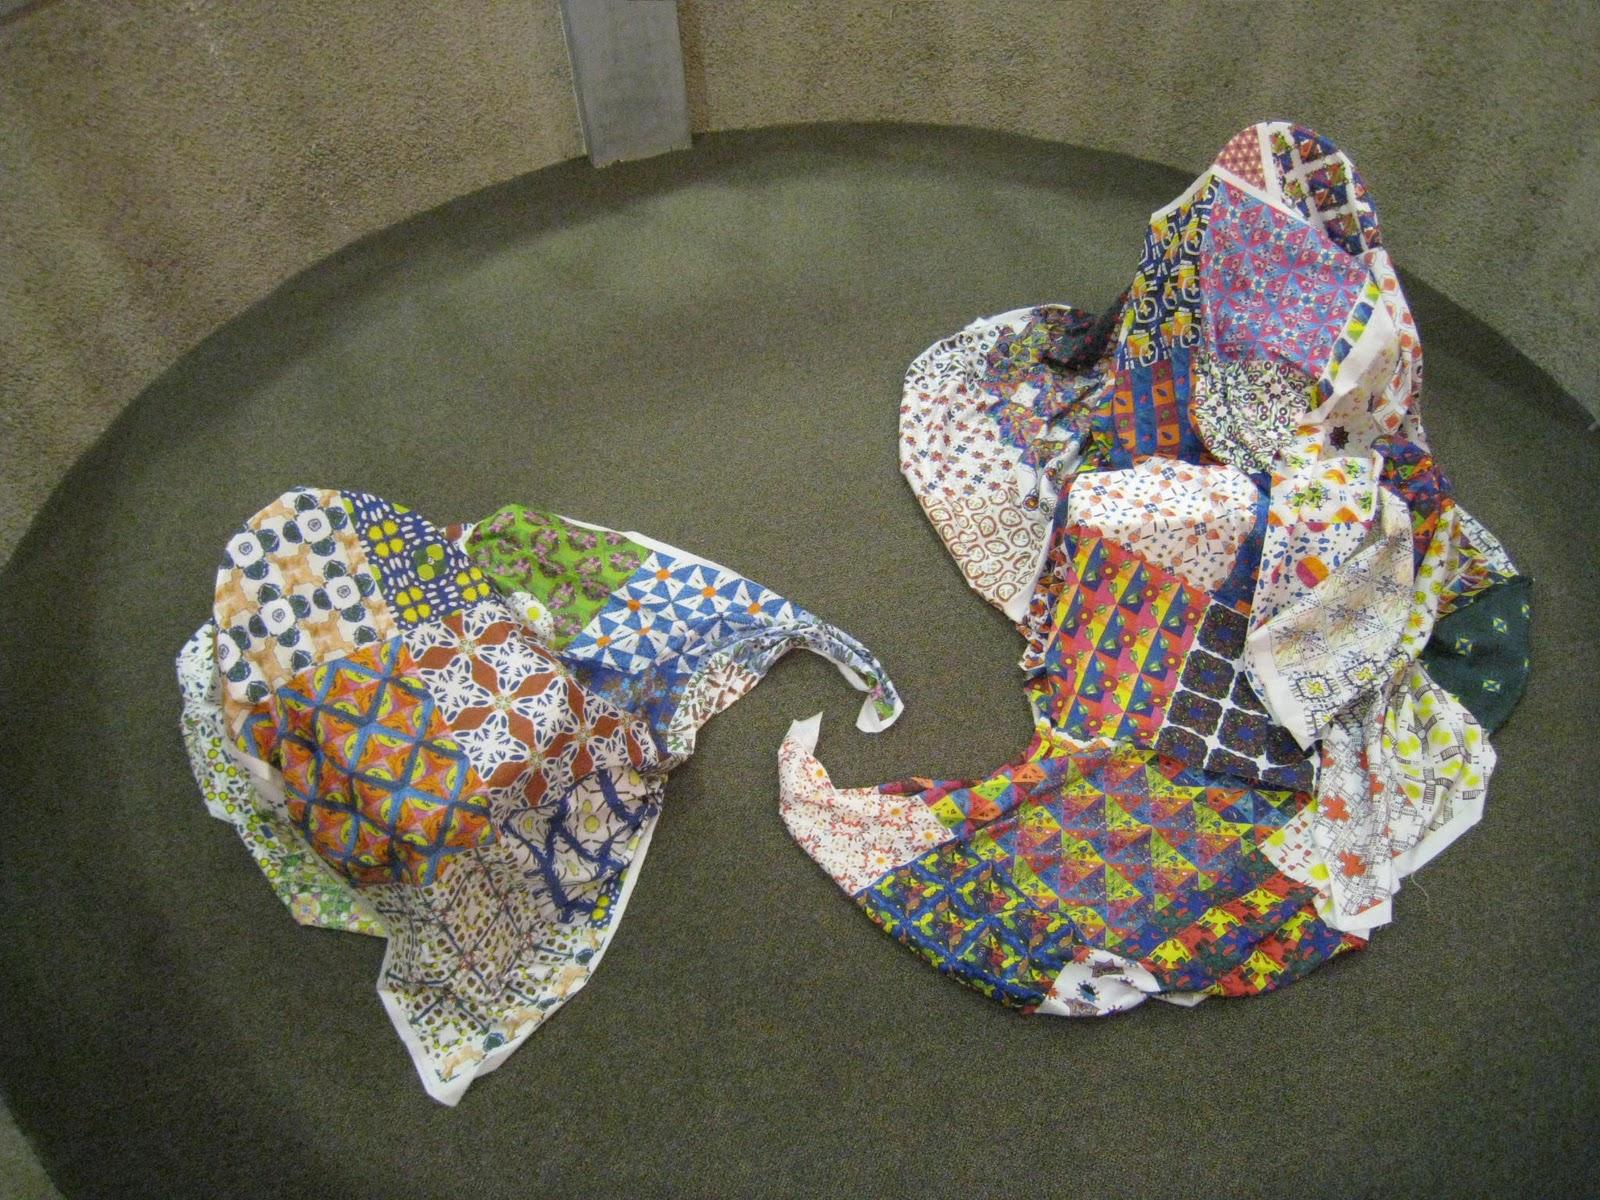 Corinne Okada Design Krause Center For Innovation Textile